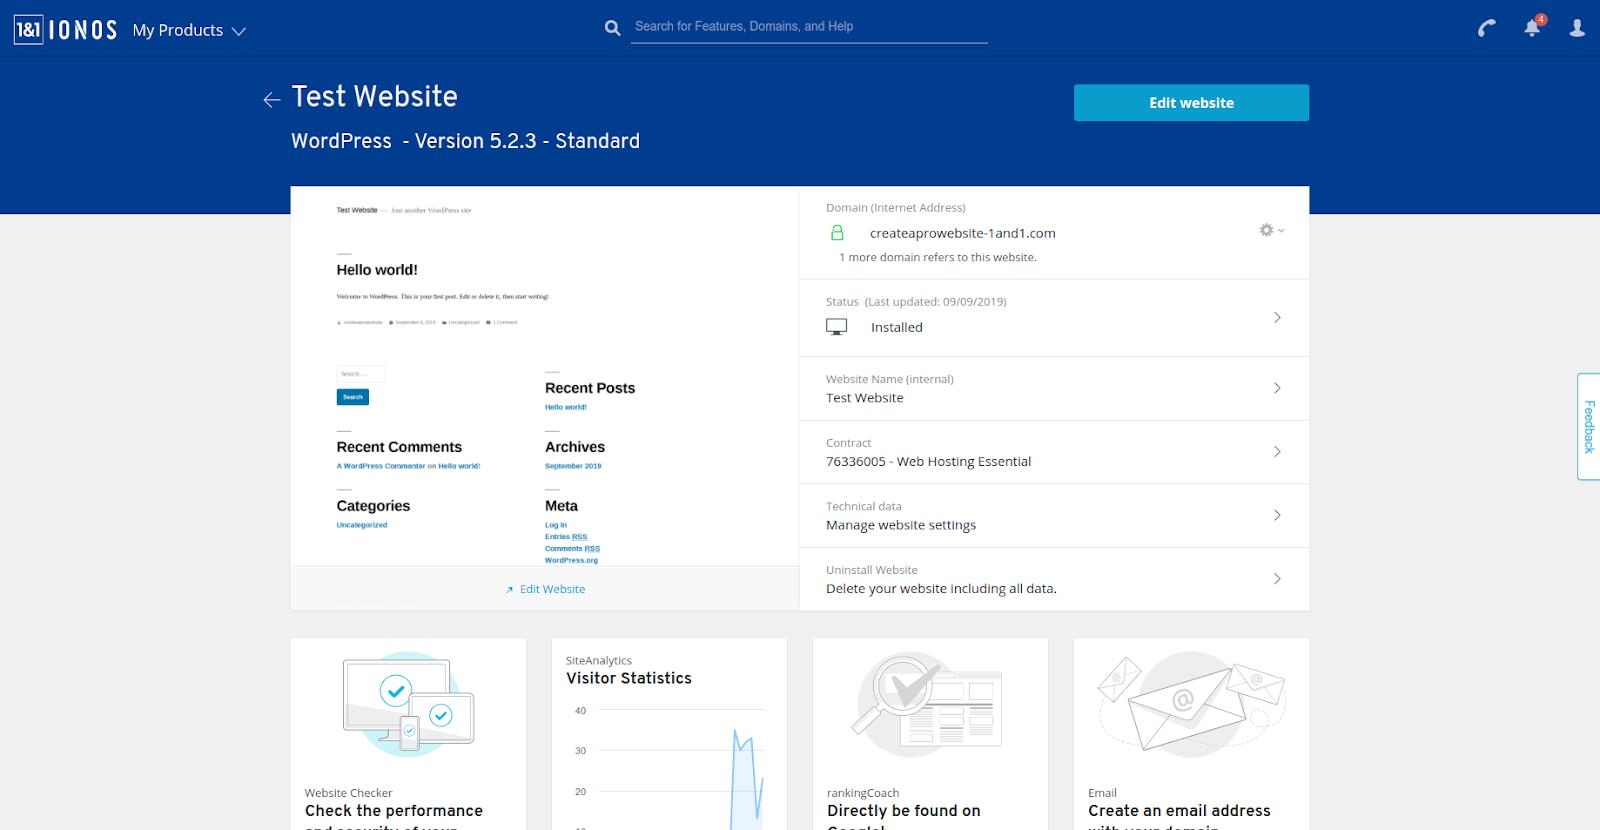 1&1 hosting management interface